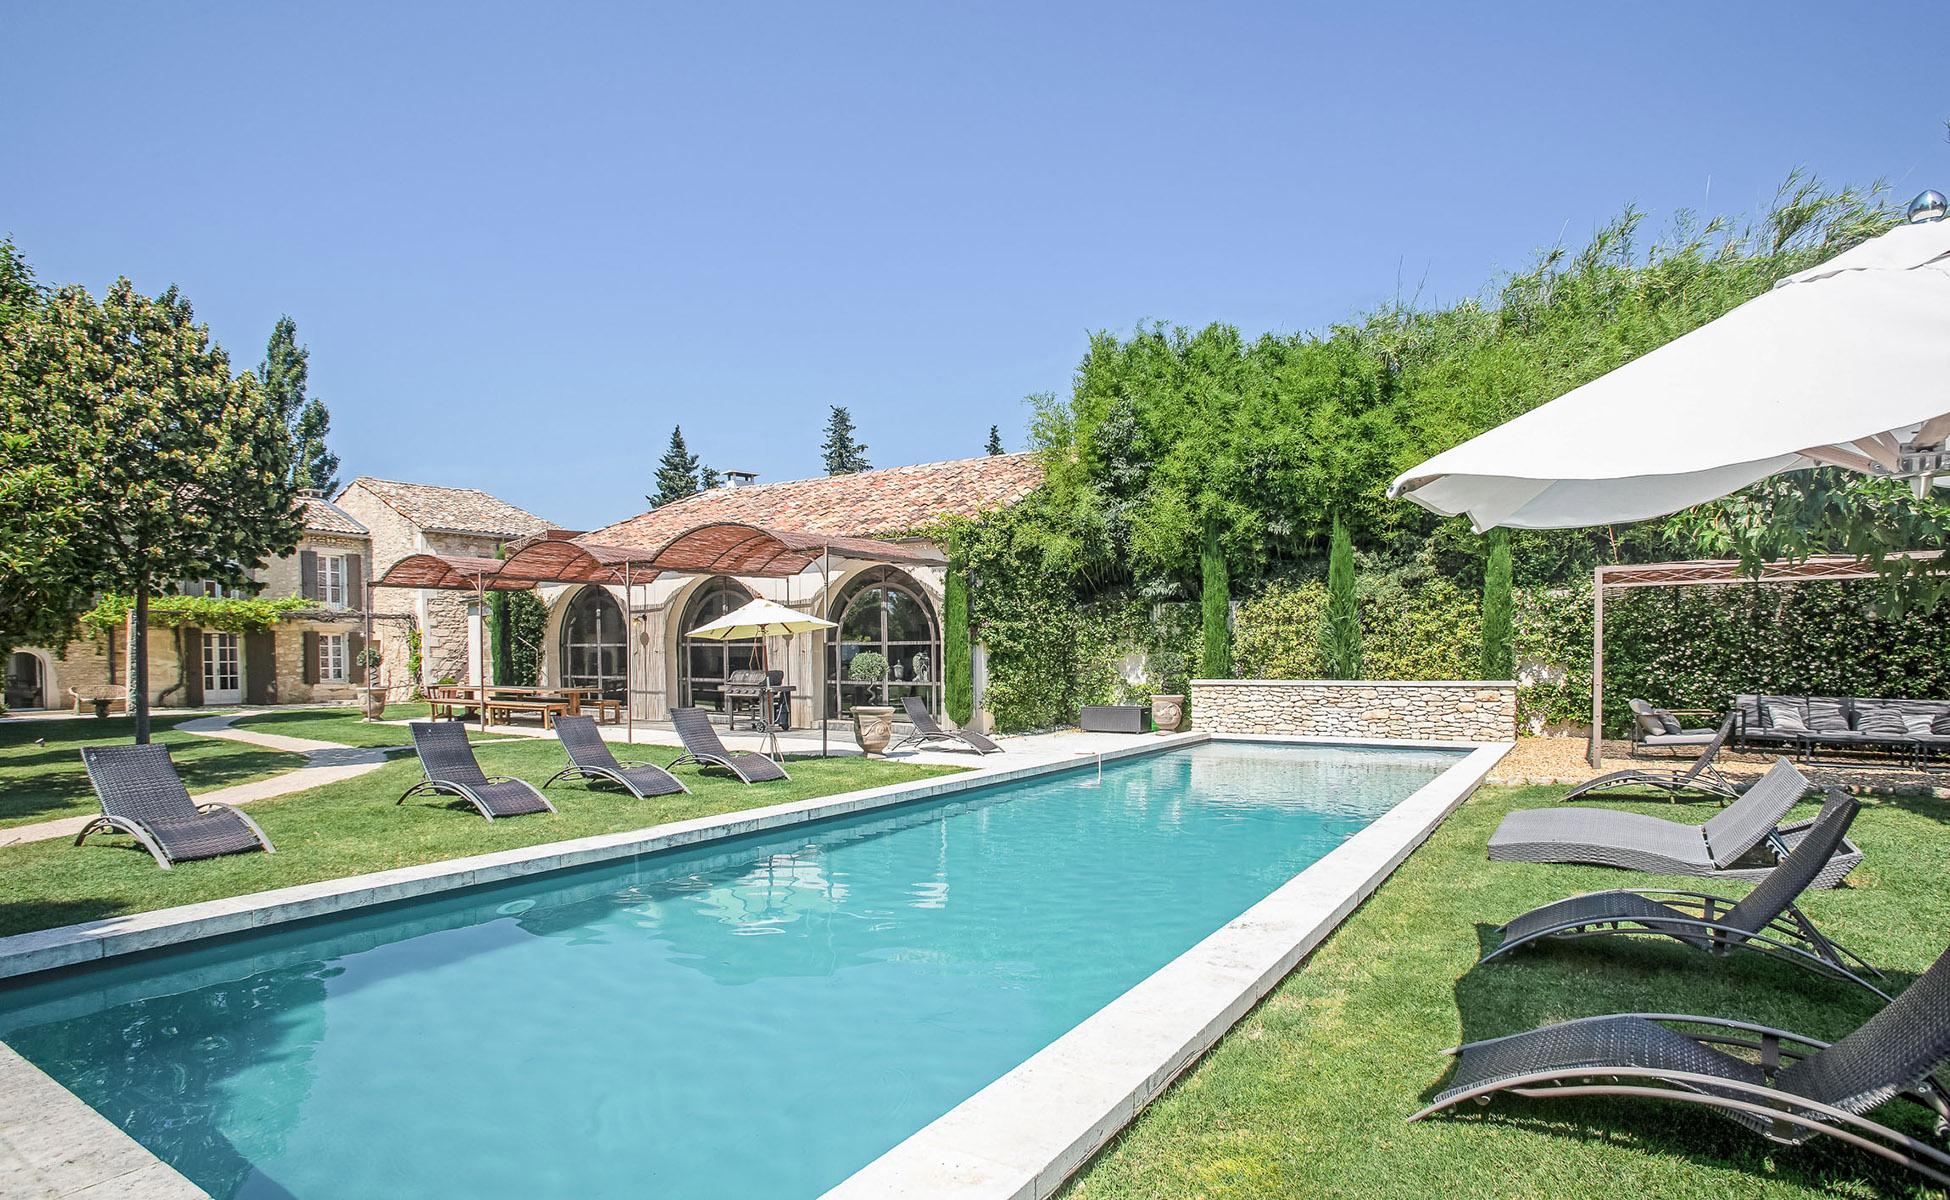 Lovelydays luxury service apartment rental - St Rémy de Provence and surroundings - Ameu Mas - Partner - 6 bedrooms - 6 bathrooms - Outside swimming pool - 894318d88a39 - Lovelydays